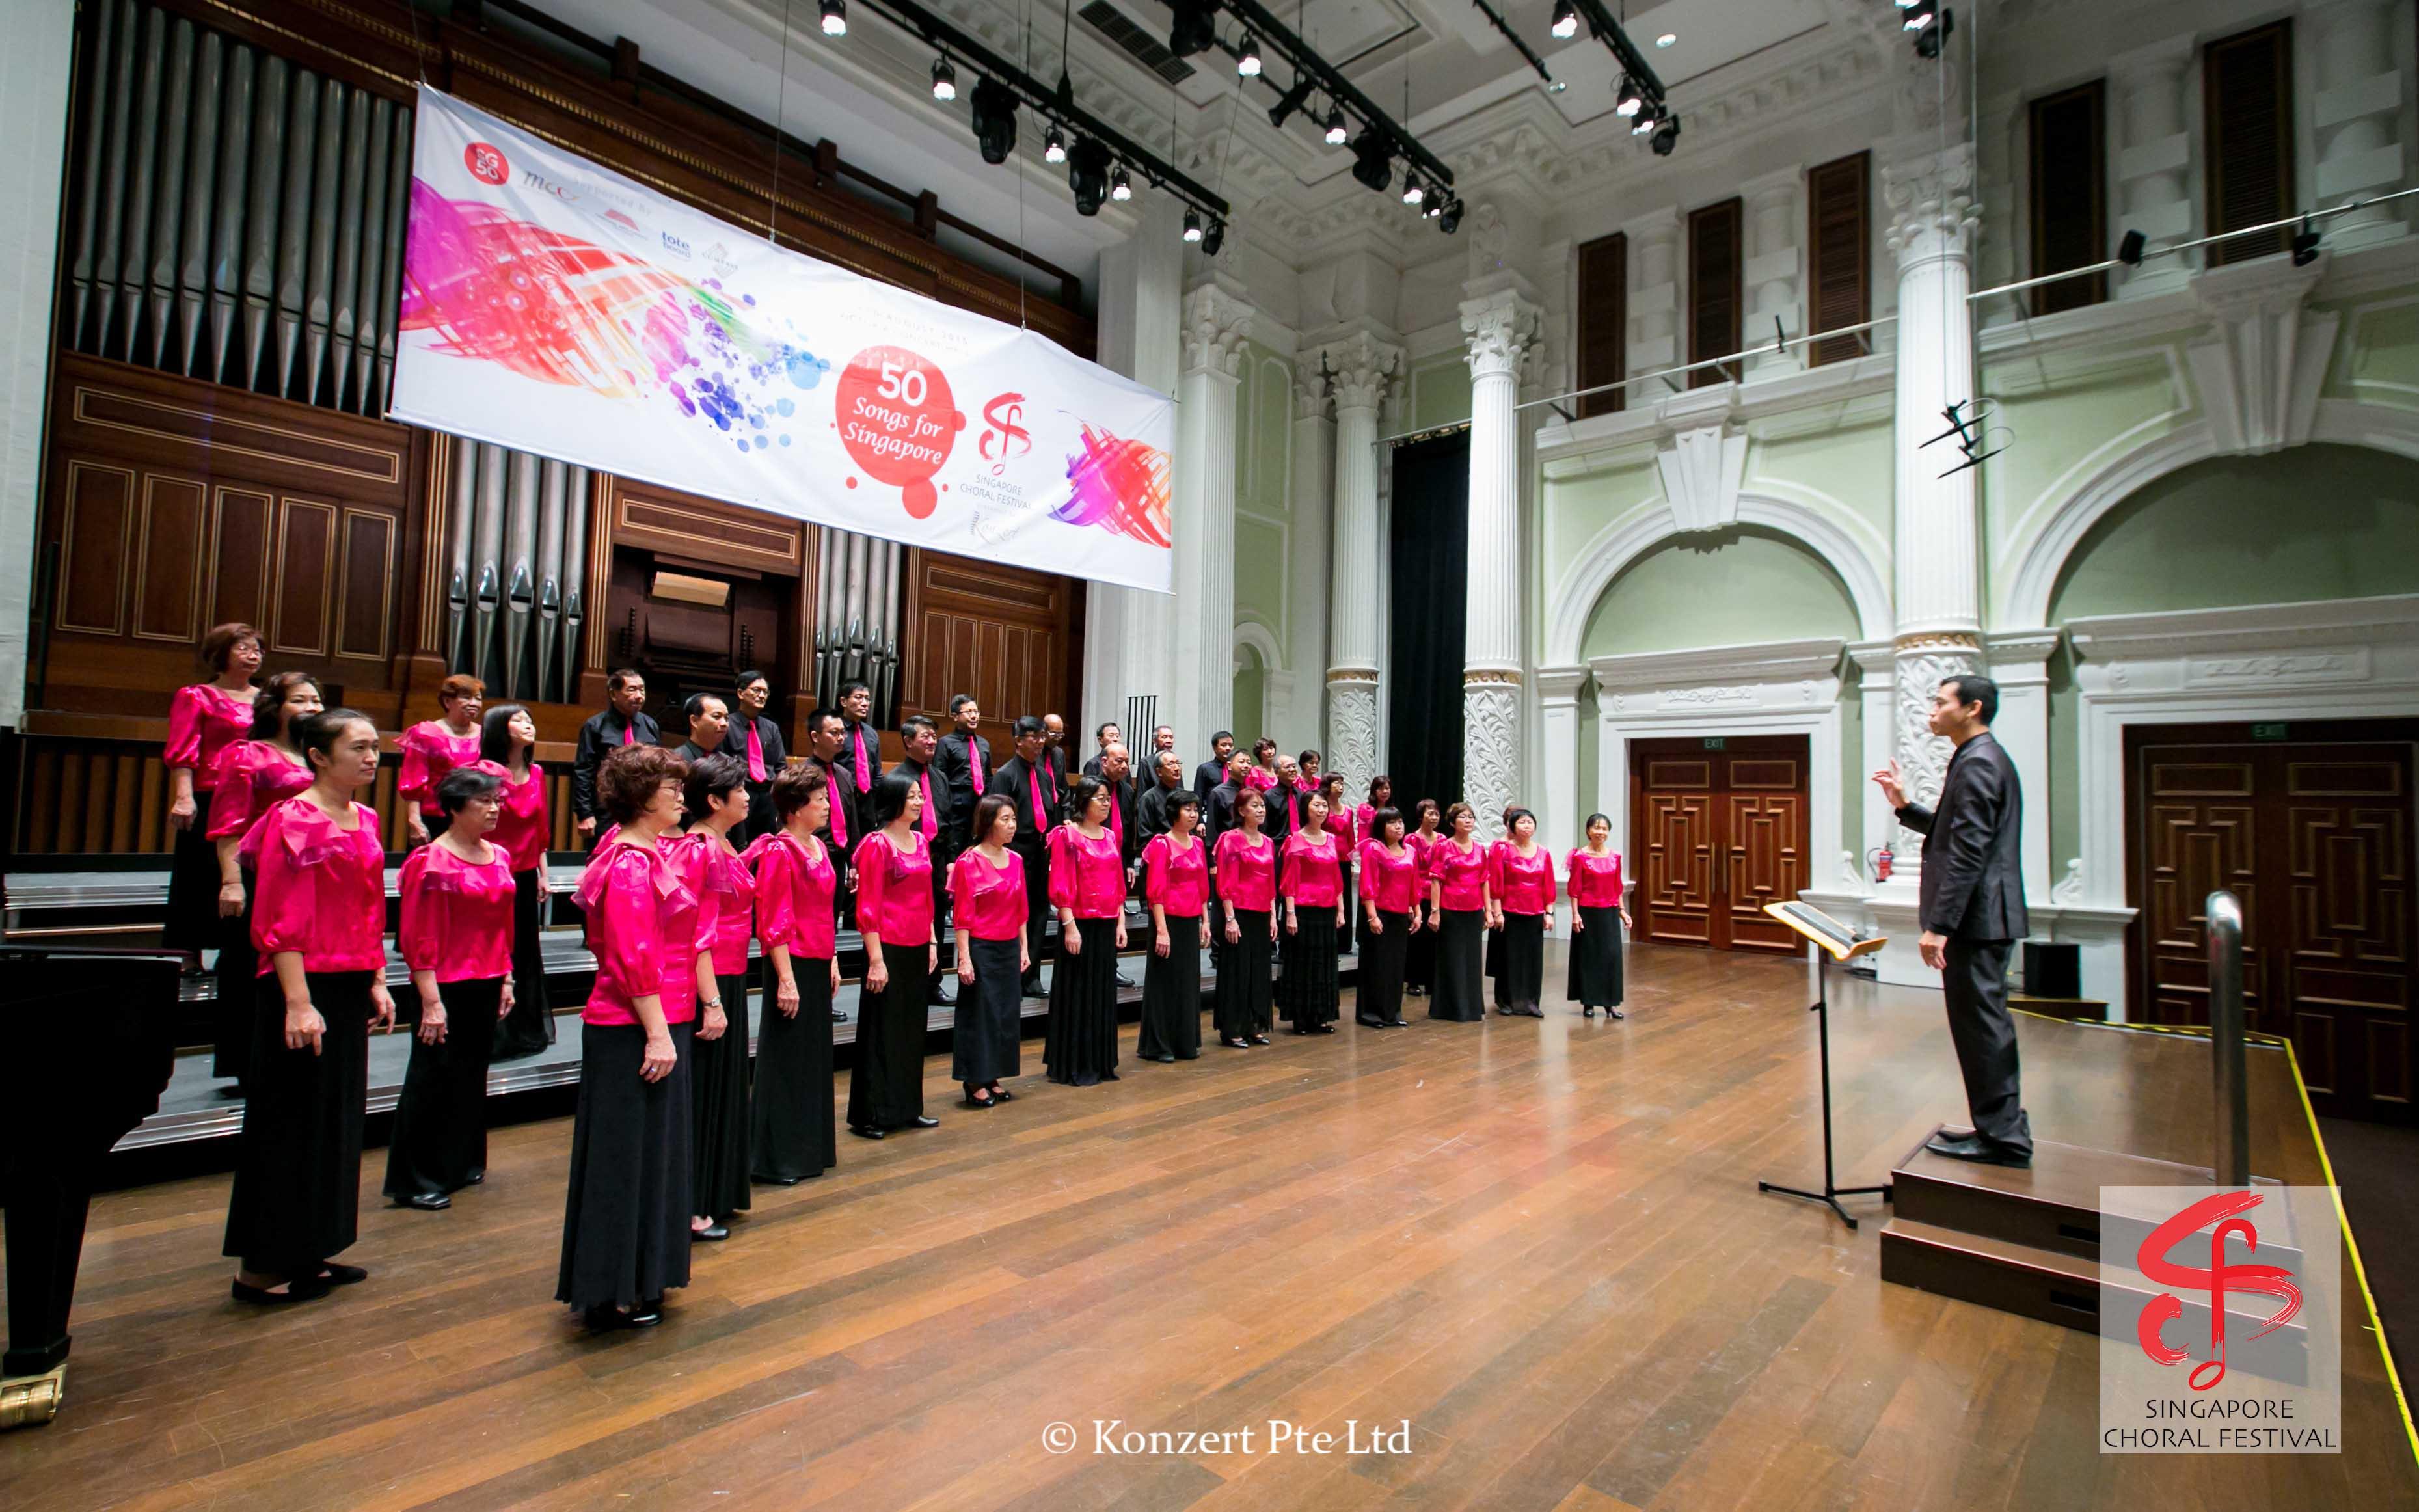 Singapore Choral Festival 7-8-15 (35).jpg